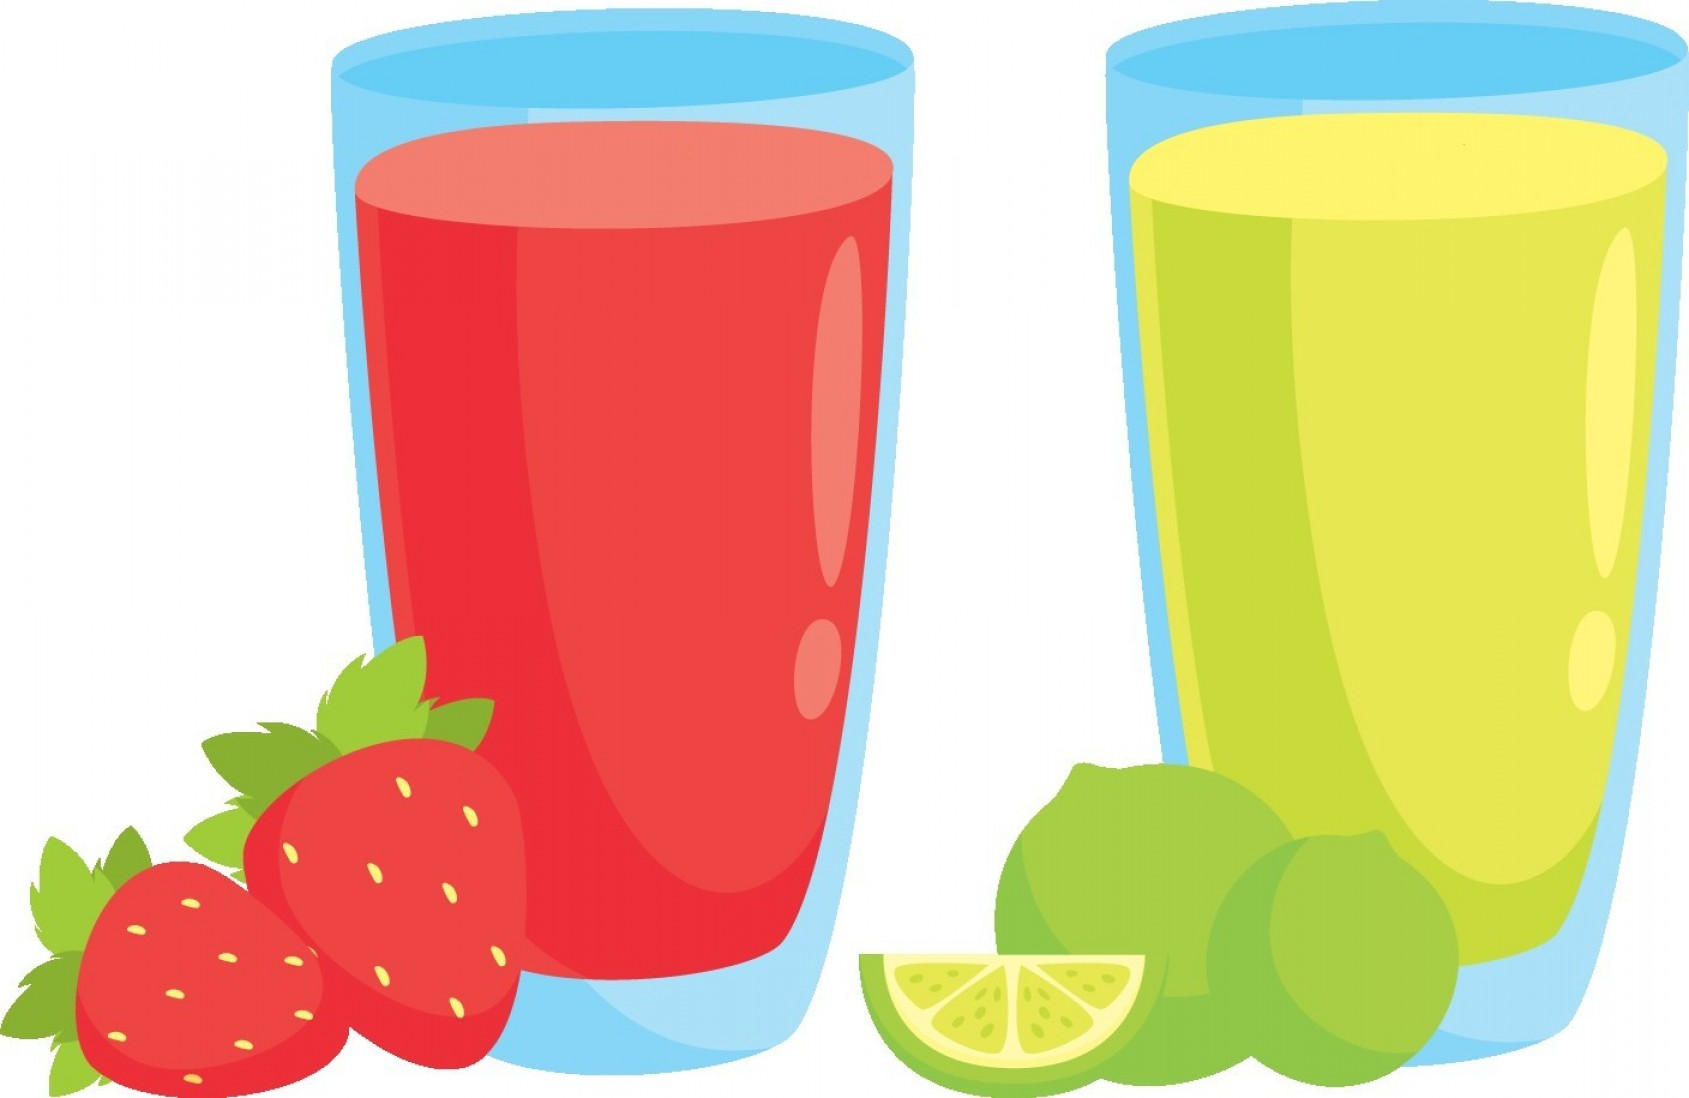 Kisspng Orange Juice Smoothie Pomegranate Juice Strawberry Vector.